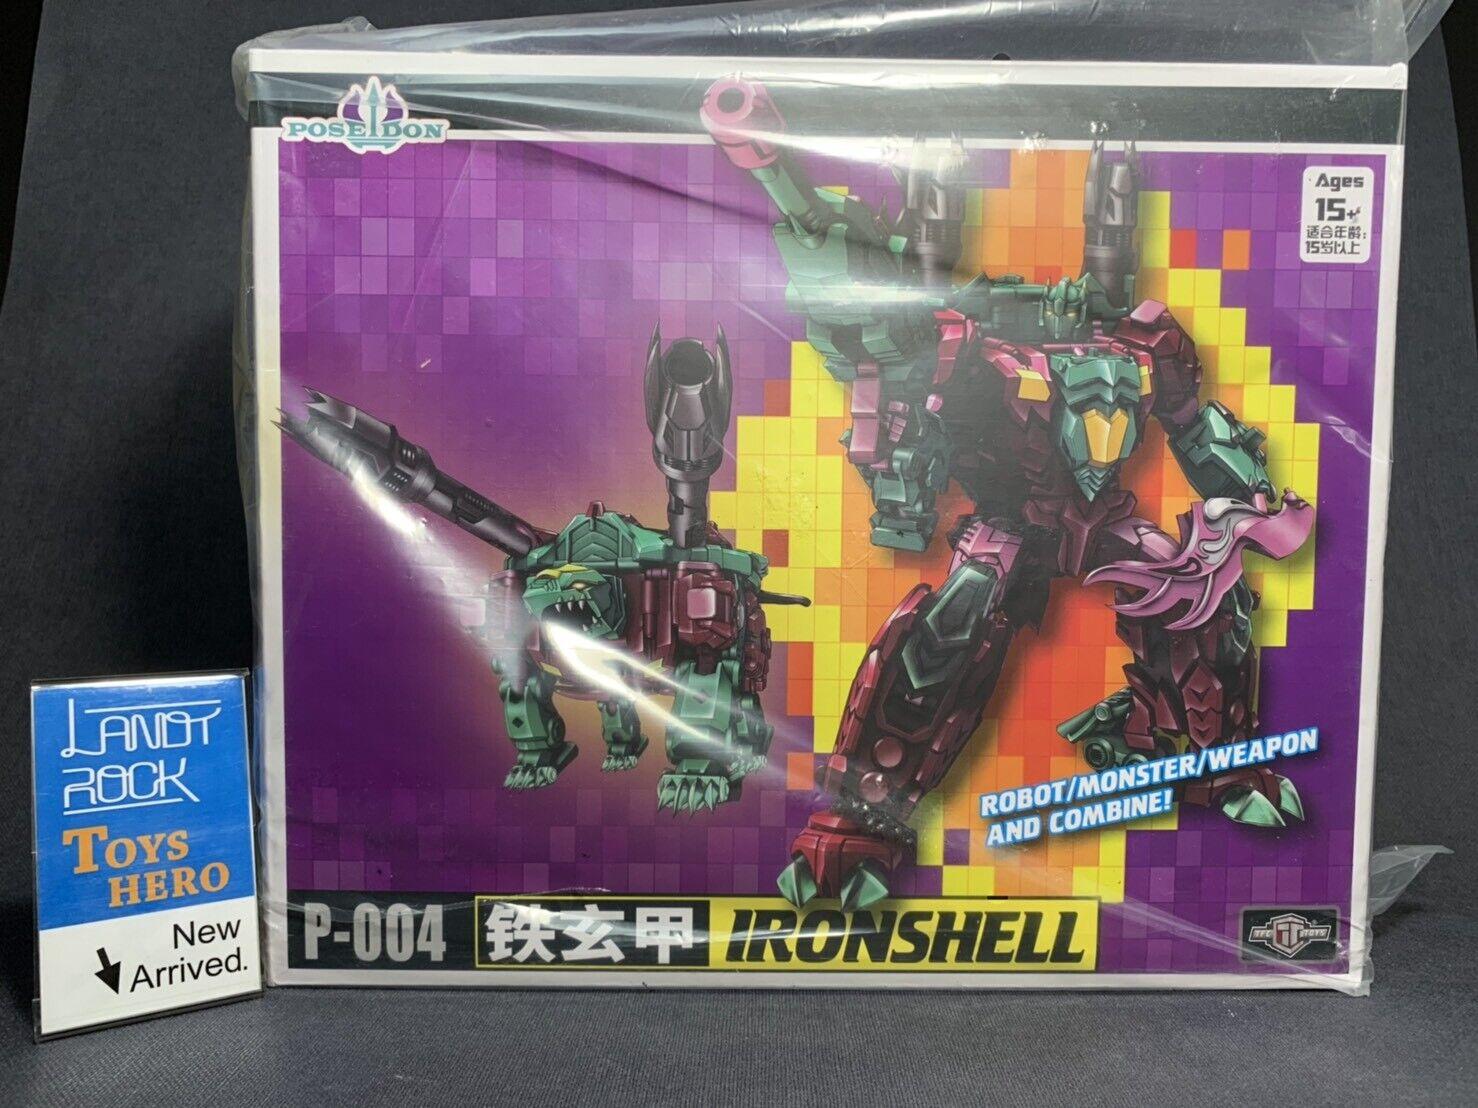 [Toys Hero] In Hand Transformers TFC P-004 IronShell Poseidon combine